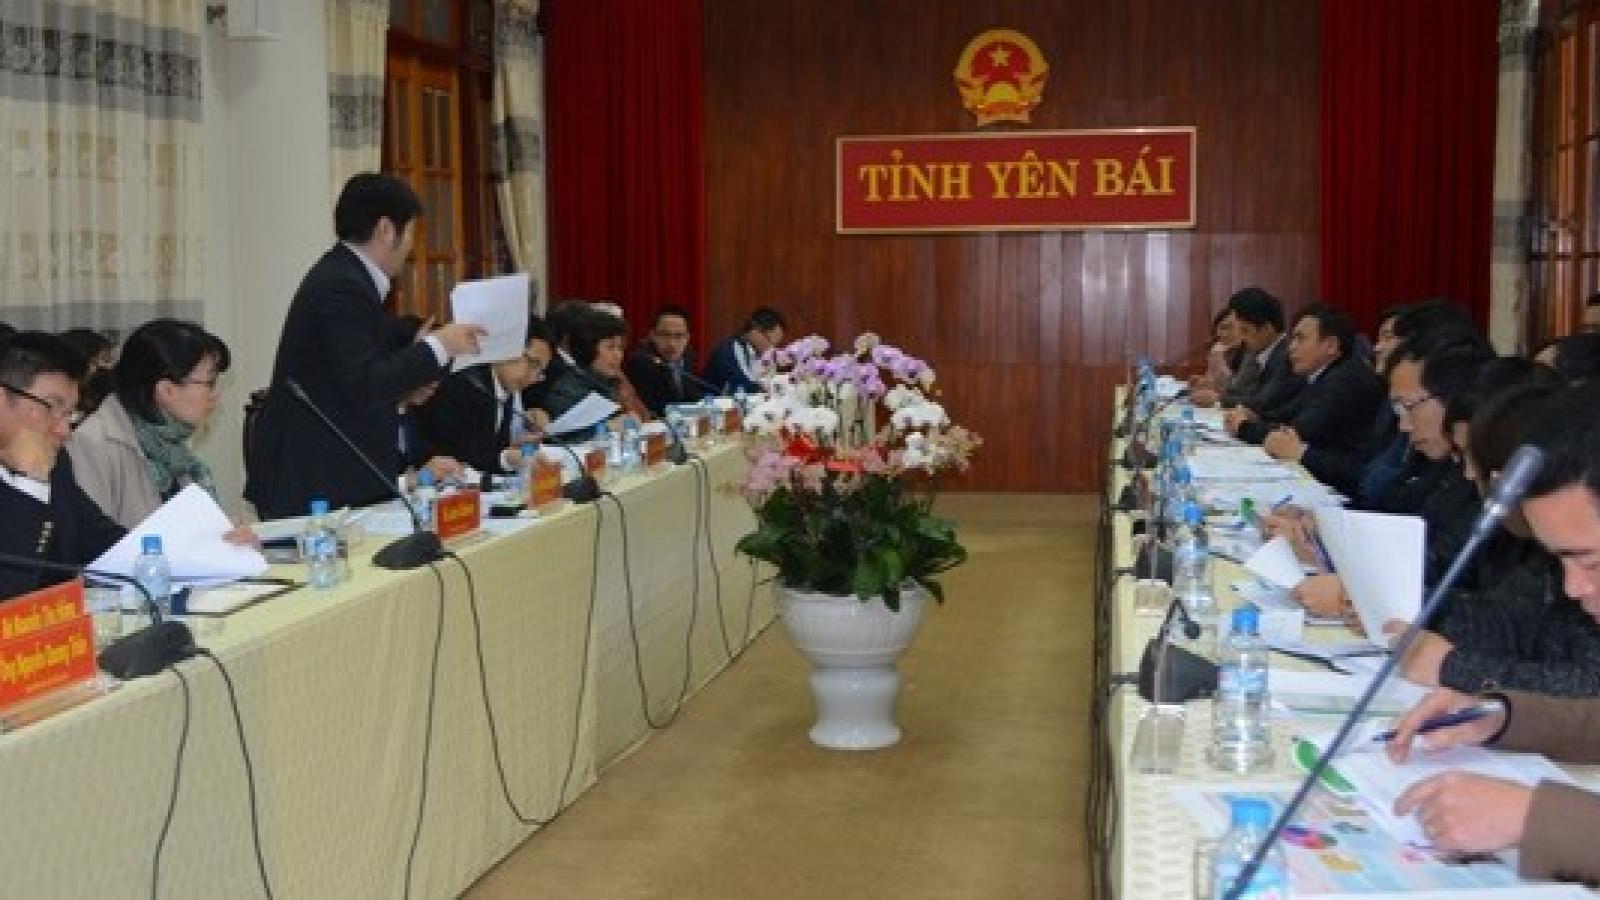 JICA helps rural development in Yen Bai